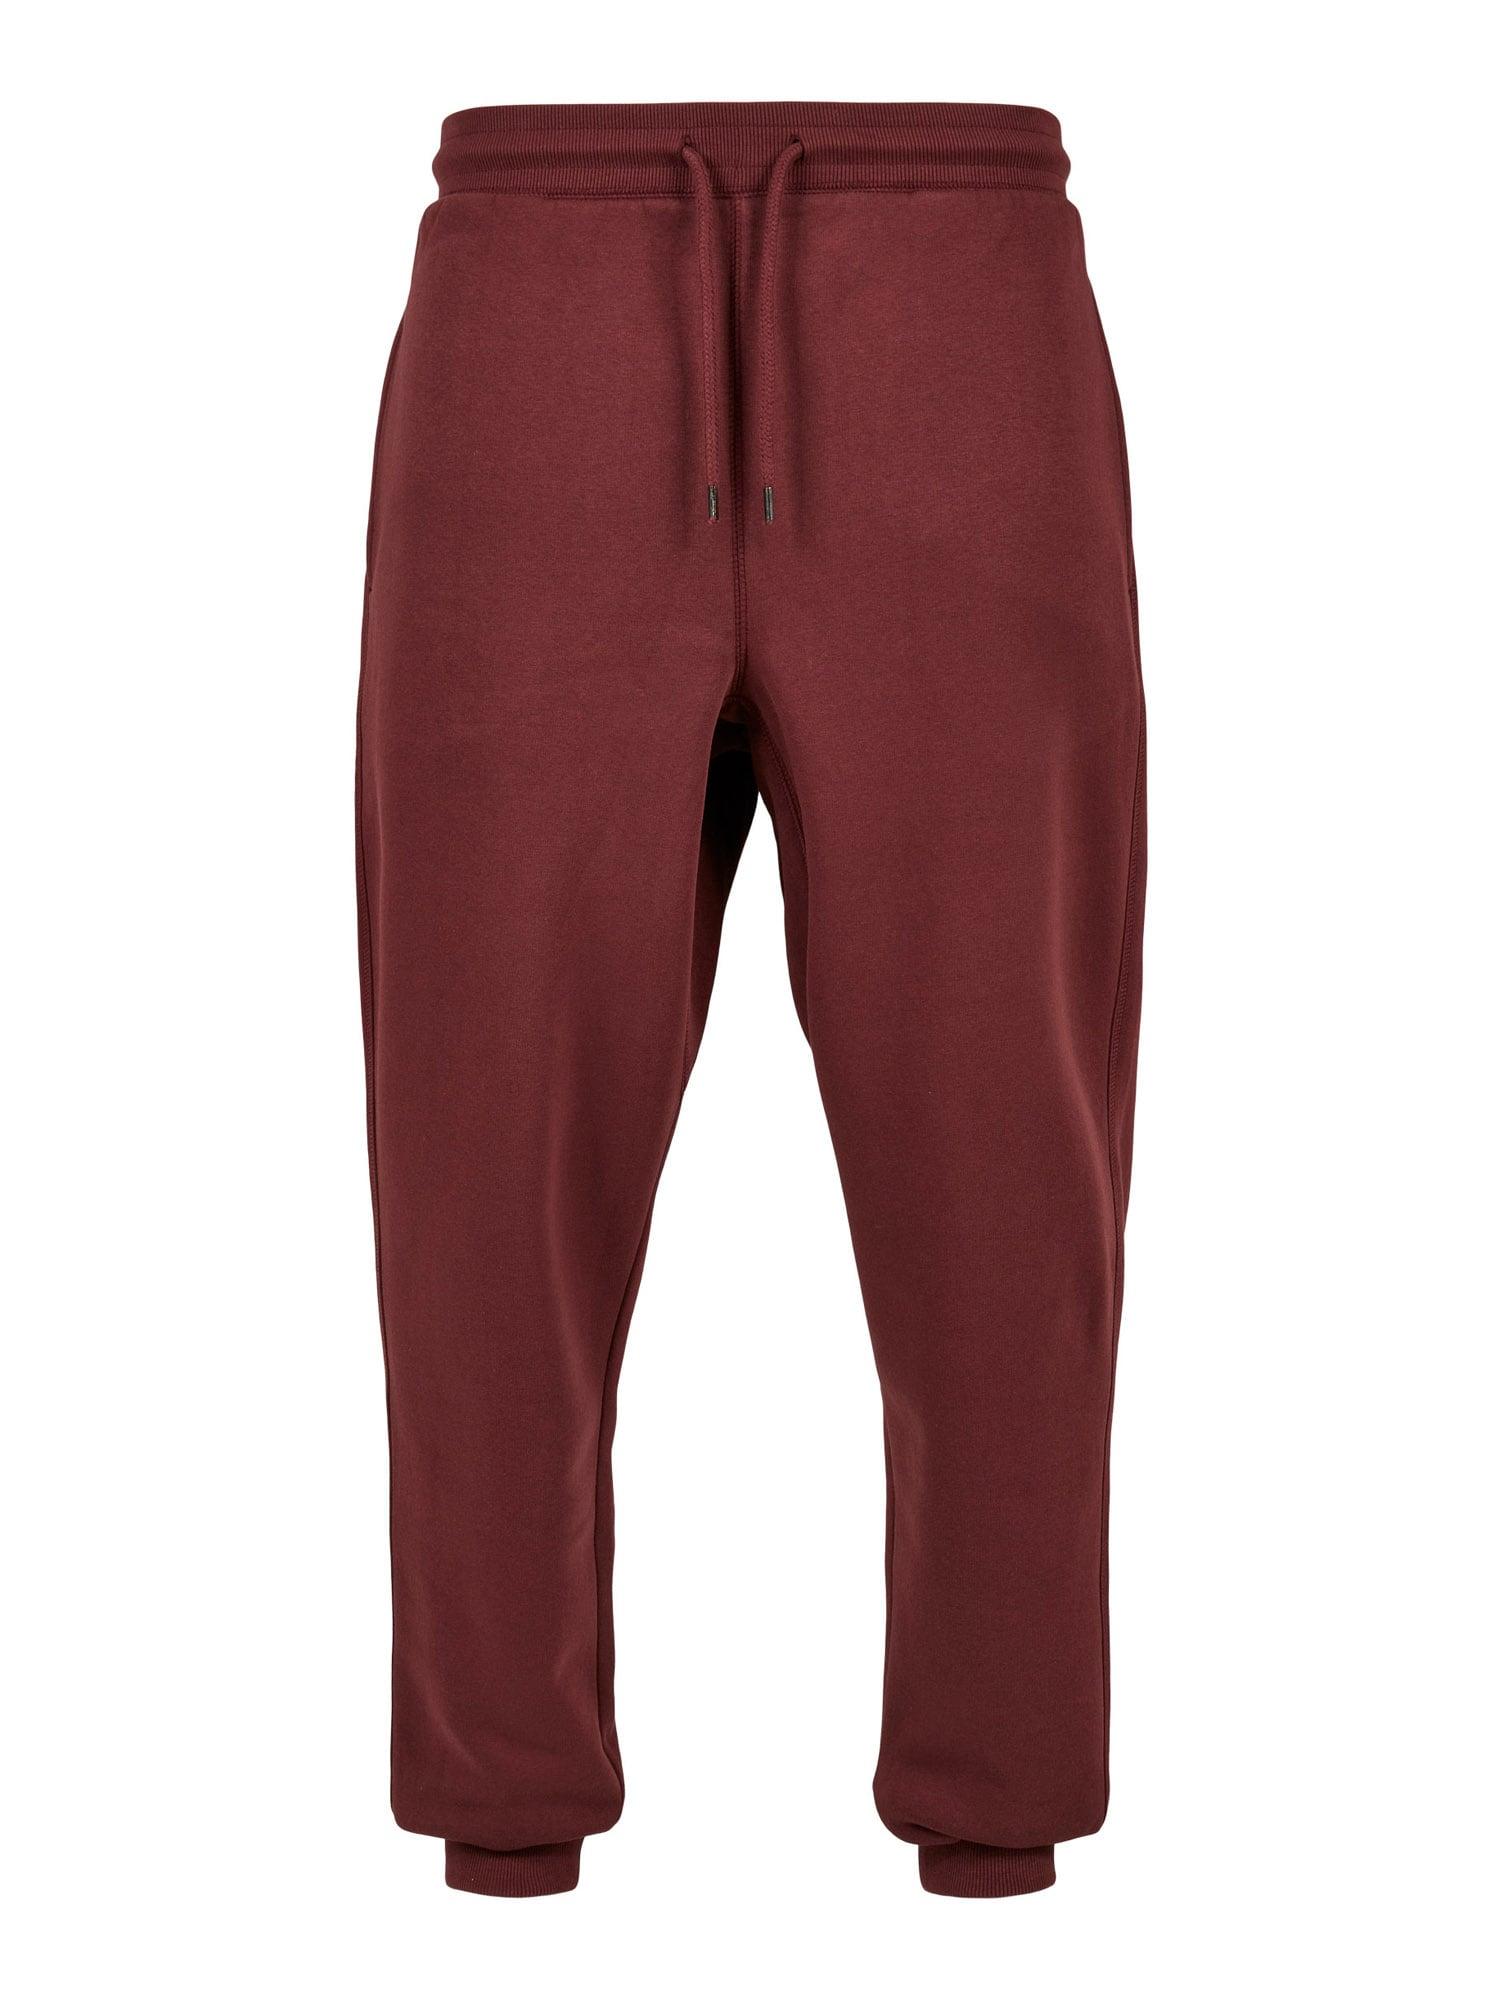 Urban Classics Kalhoty  červená třešeň